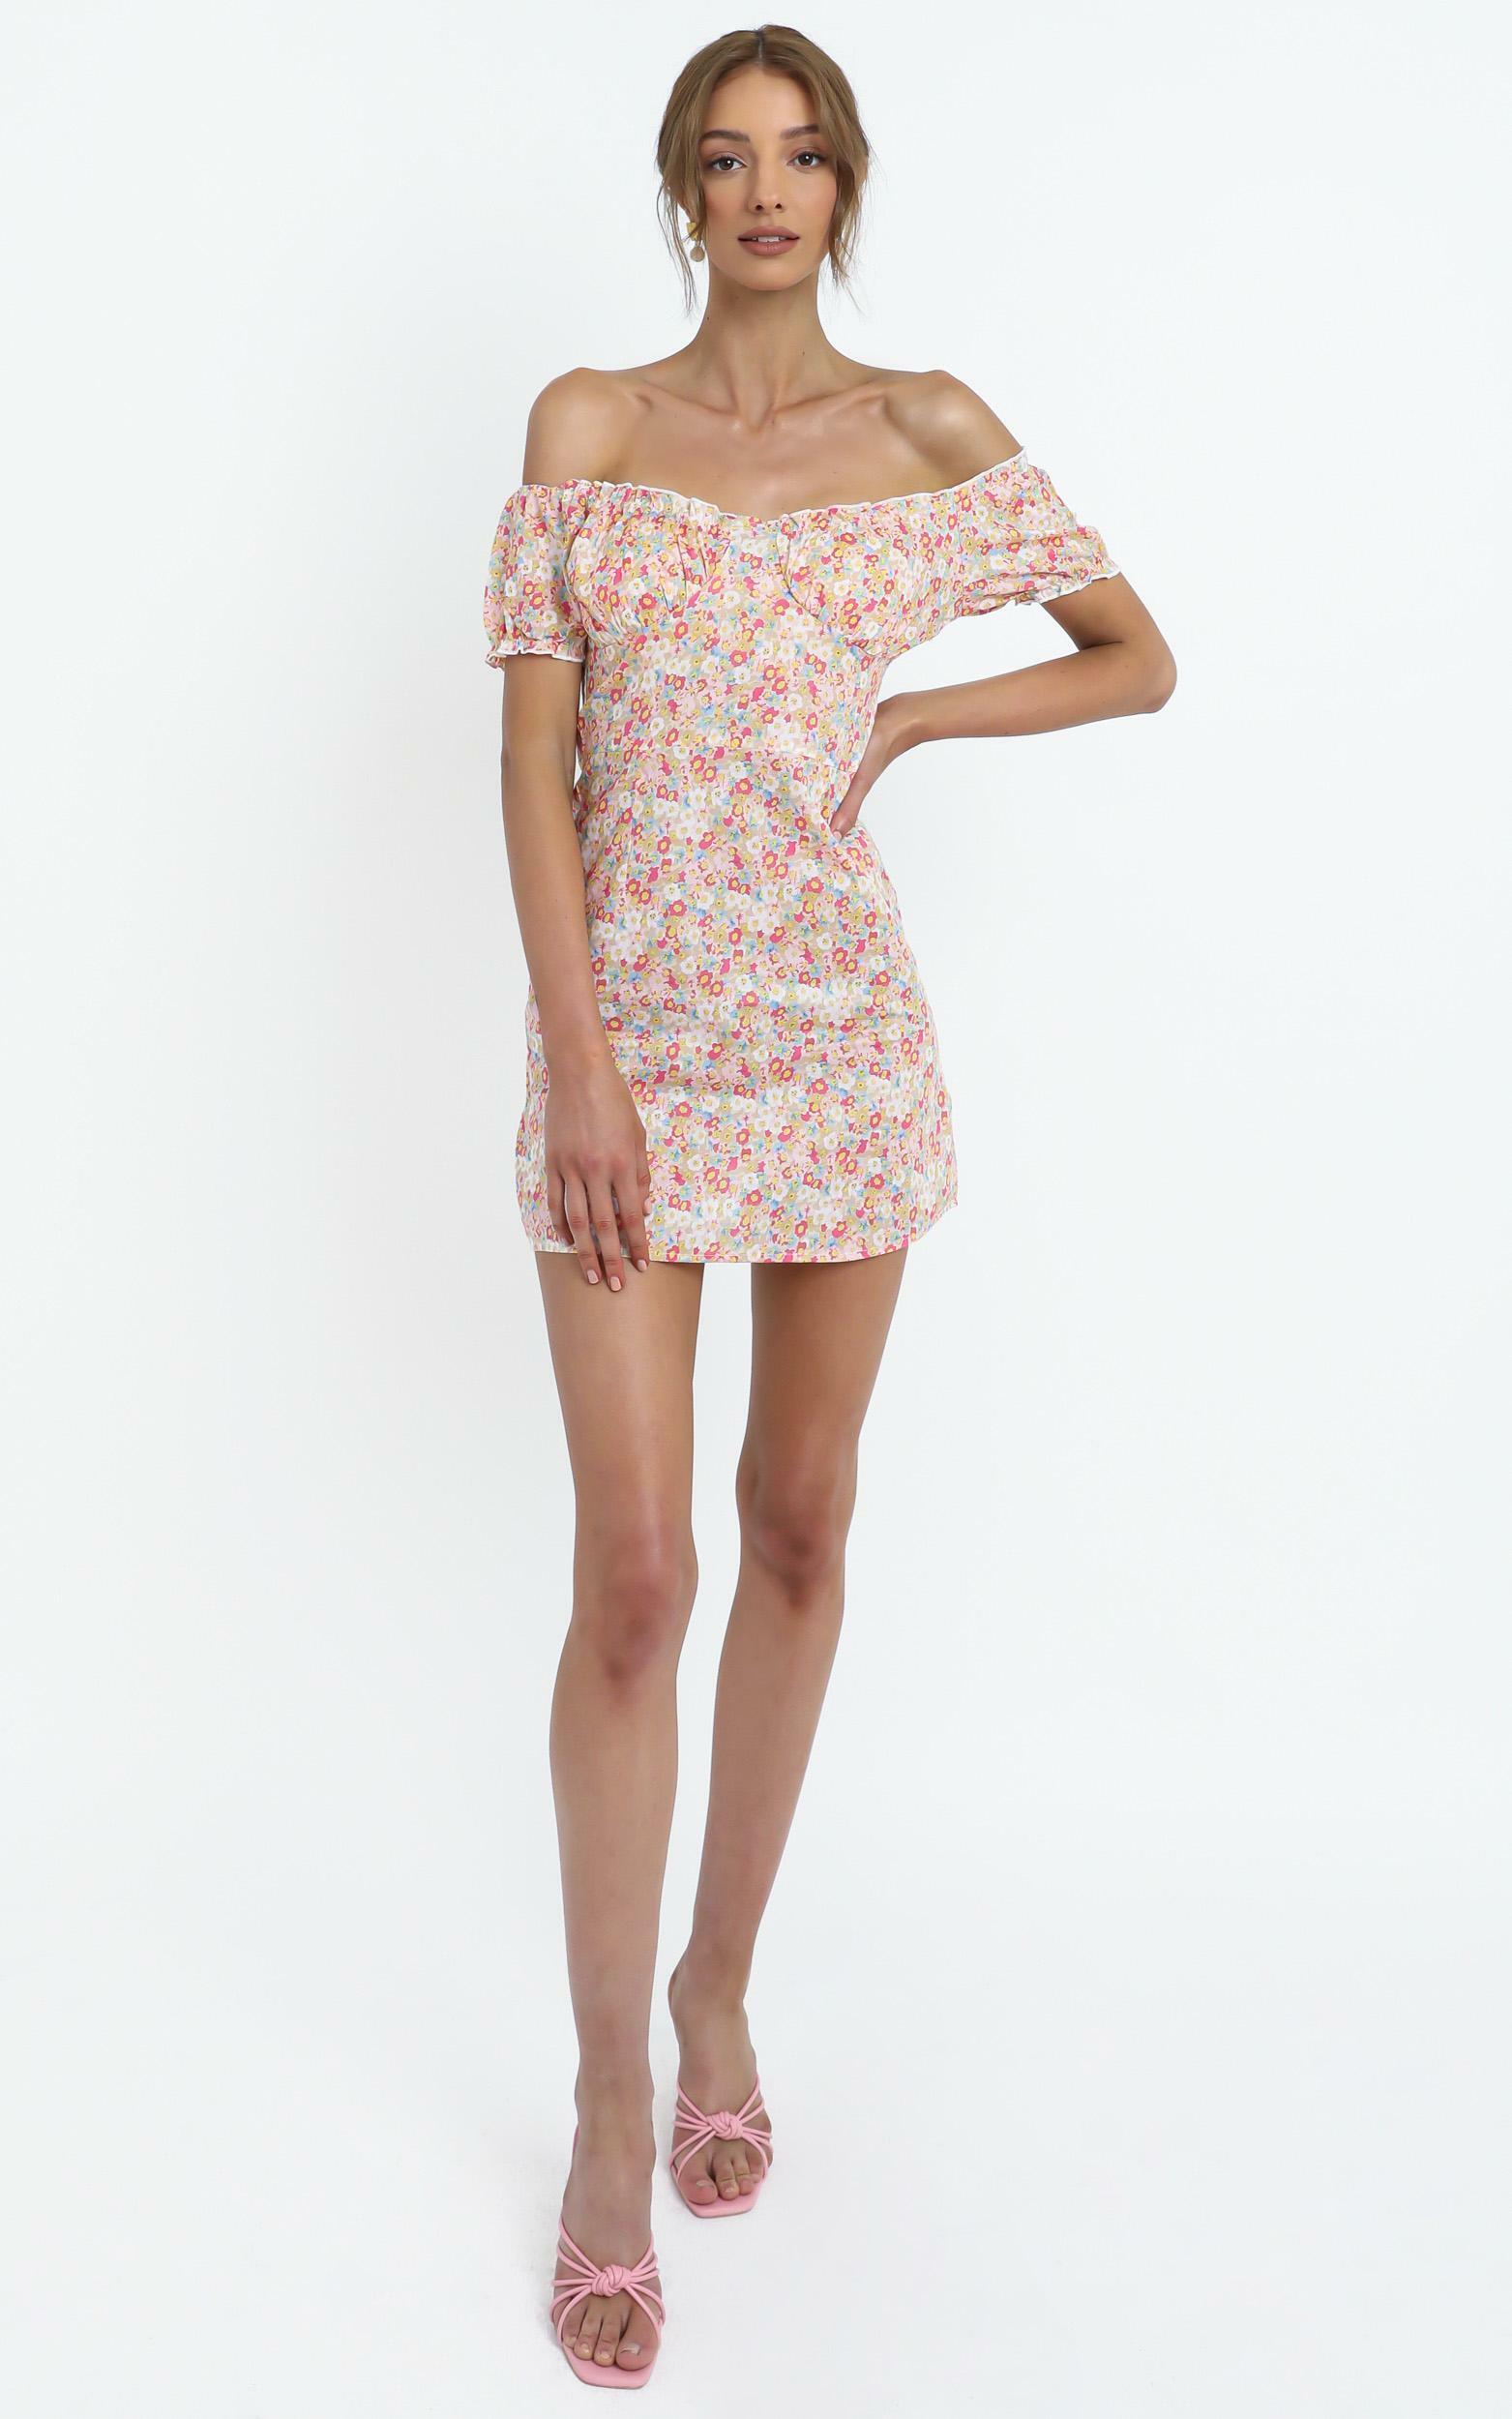 Meadows Dress in Pink Floral - 12 (L), Pink, hi-res image number null